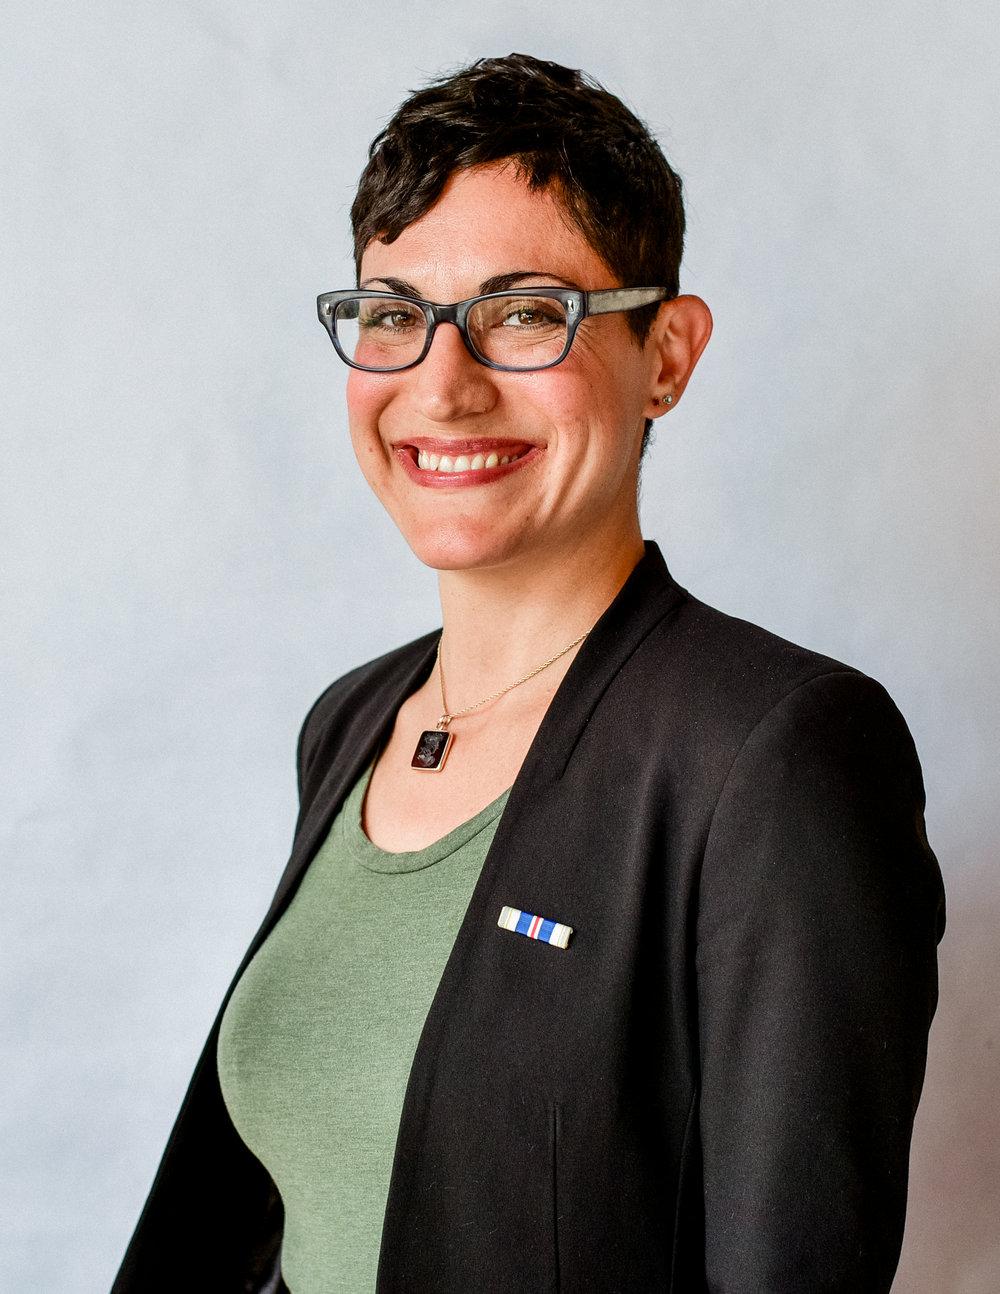 Shira Frank - Founding Member